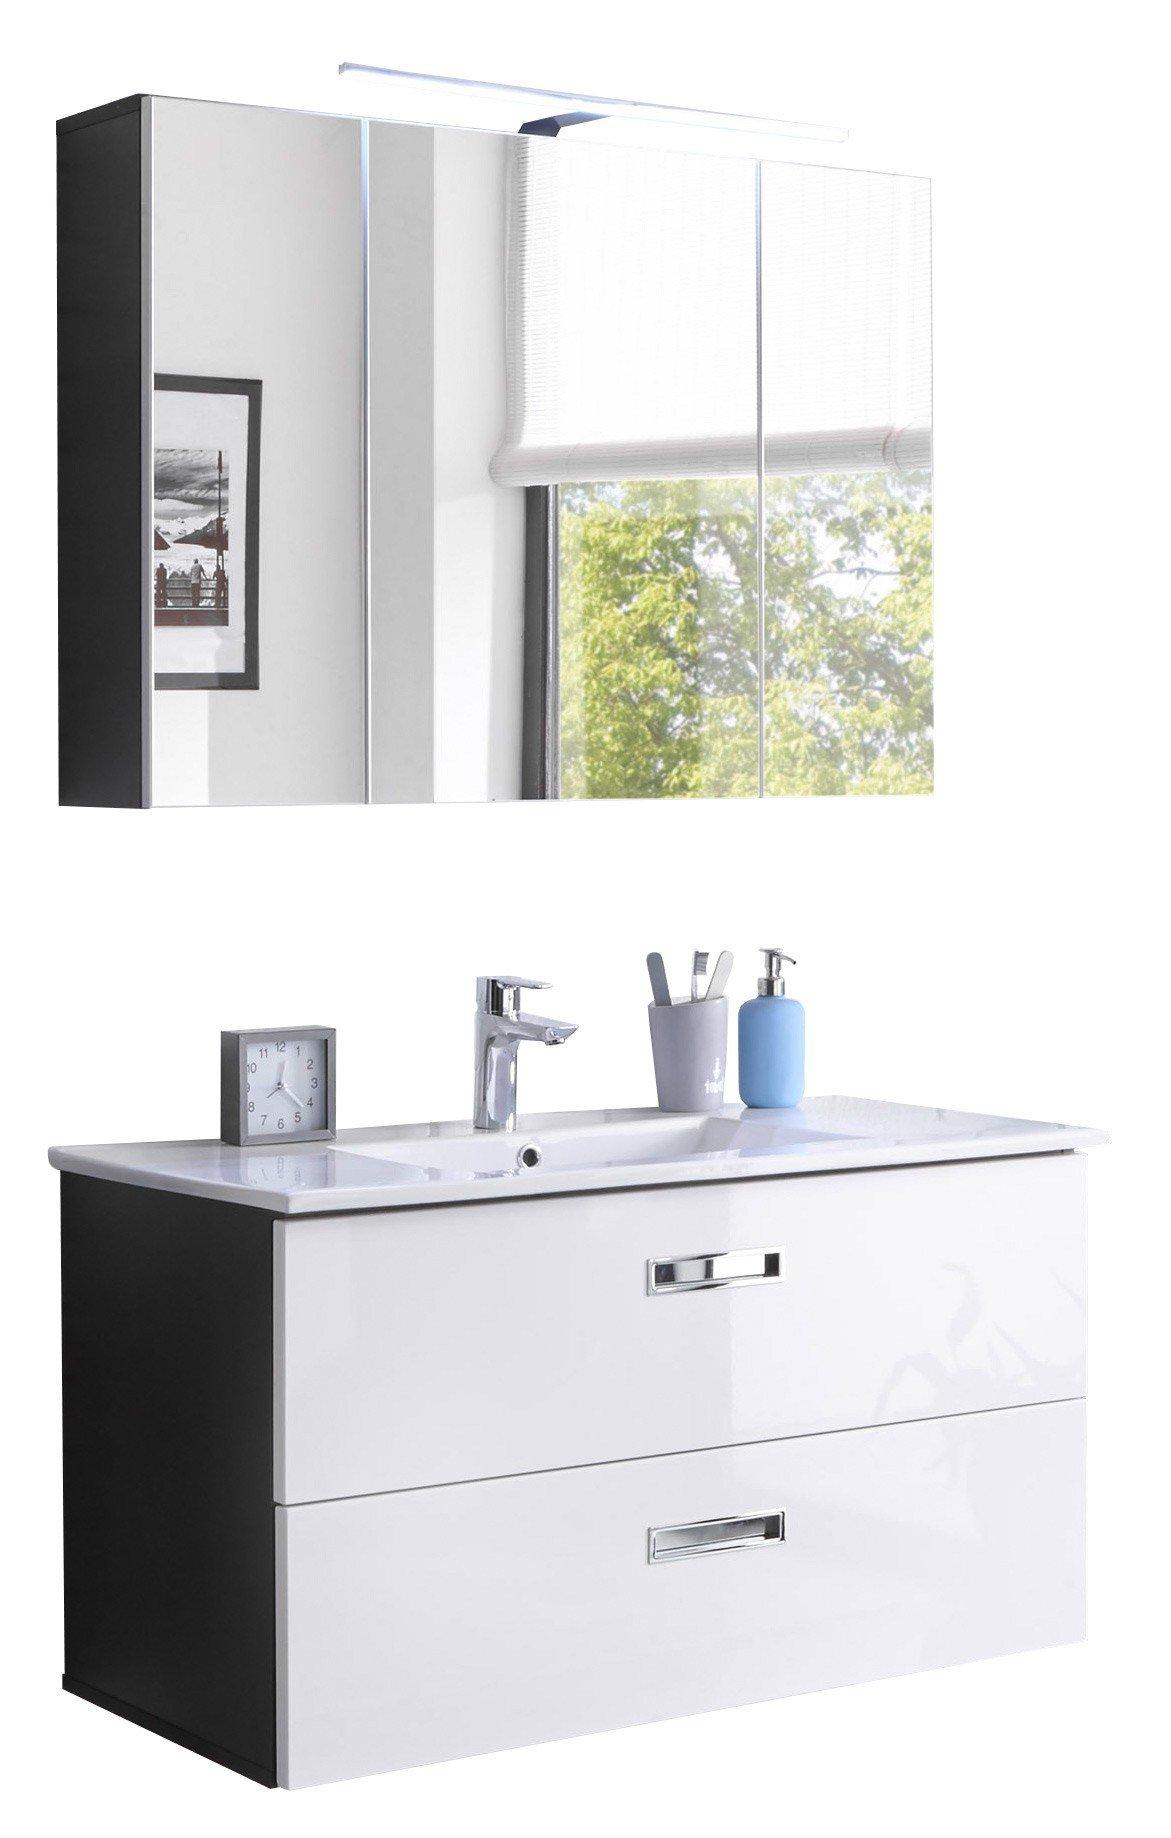 bega badezimmer manhattan m bel letz ihr online shop. Black Bedroom Furniture Sets. Home Design Ideas